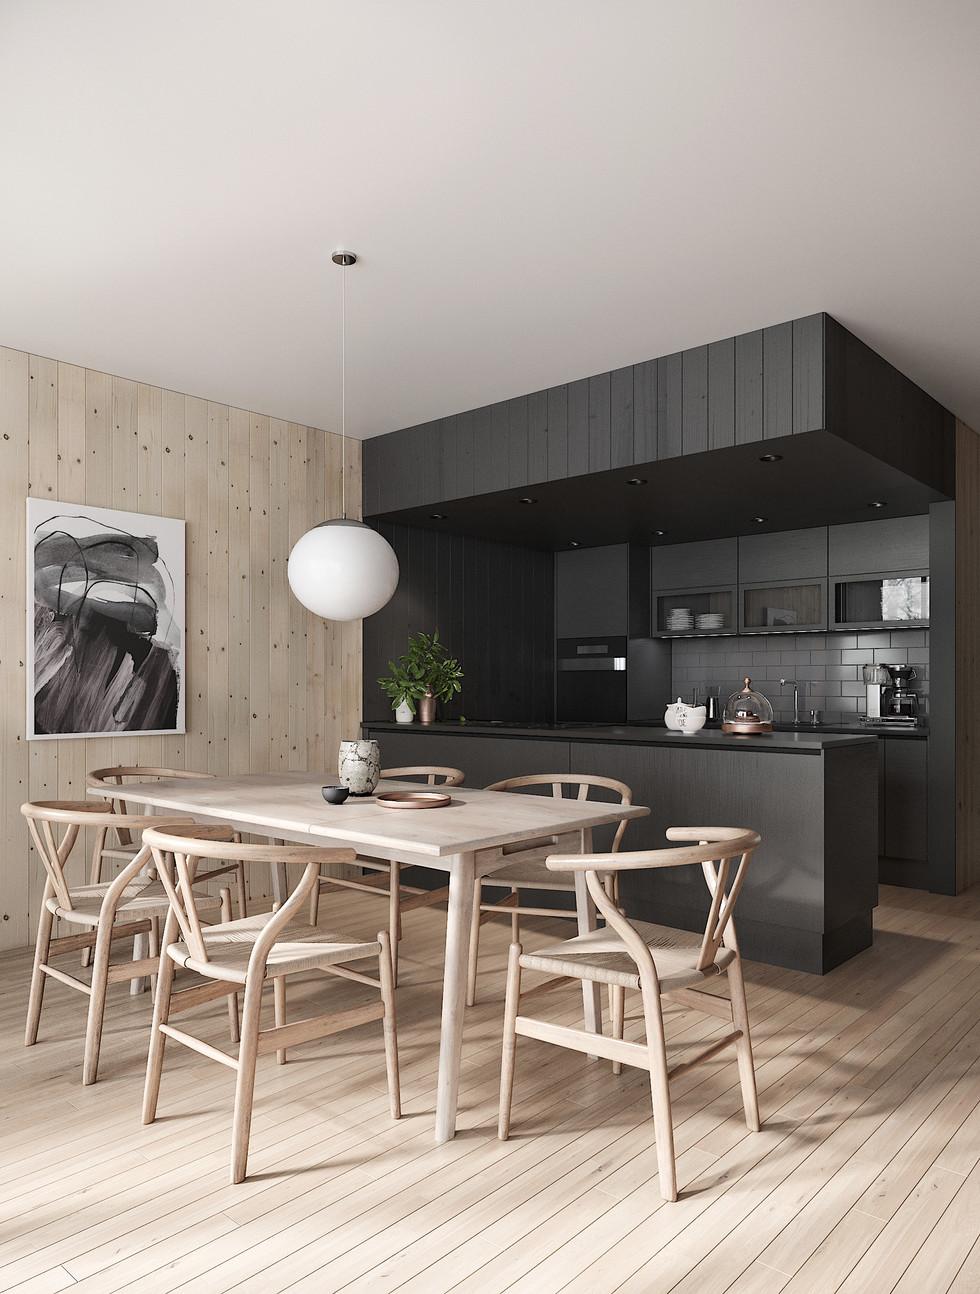 PREVIEW_Rekkehus_kitchen_01_final.jpg